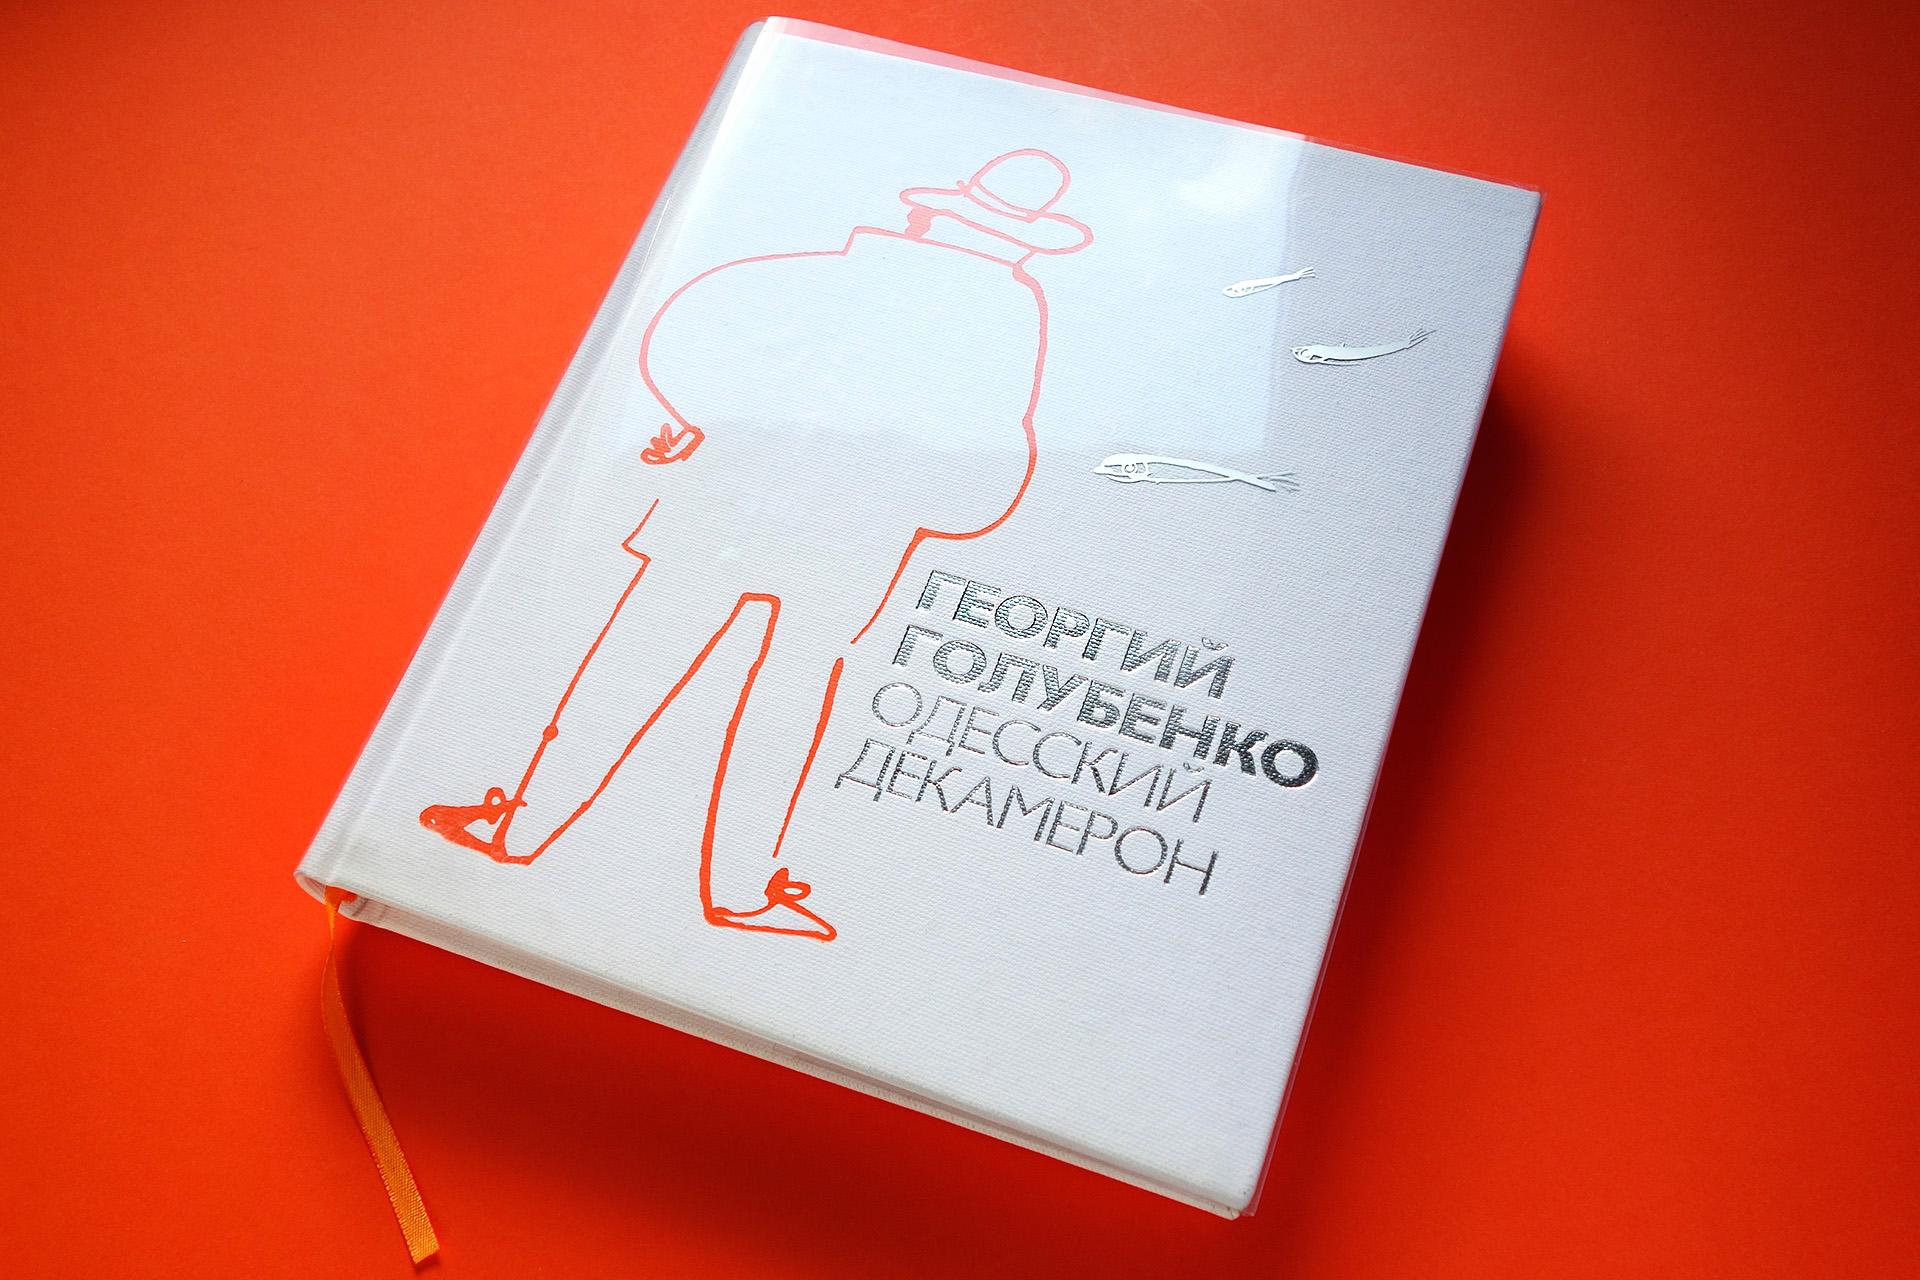 Asgard Branding, anniversary album, cover design, printed publications, book design, George Golubenko, Michael Reva, illustrations